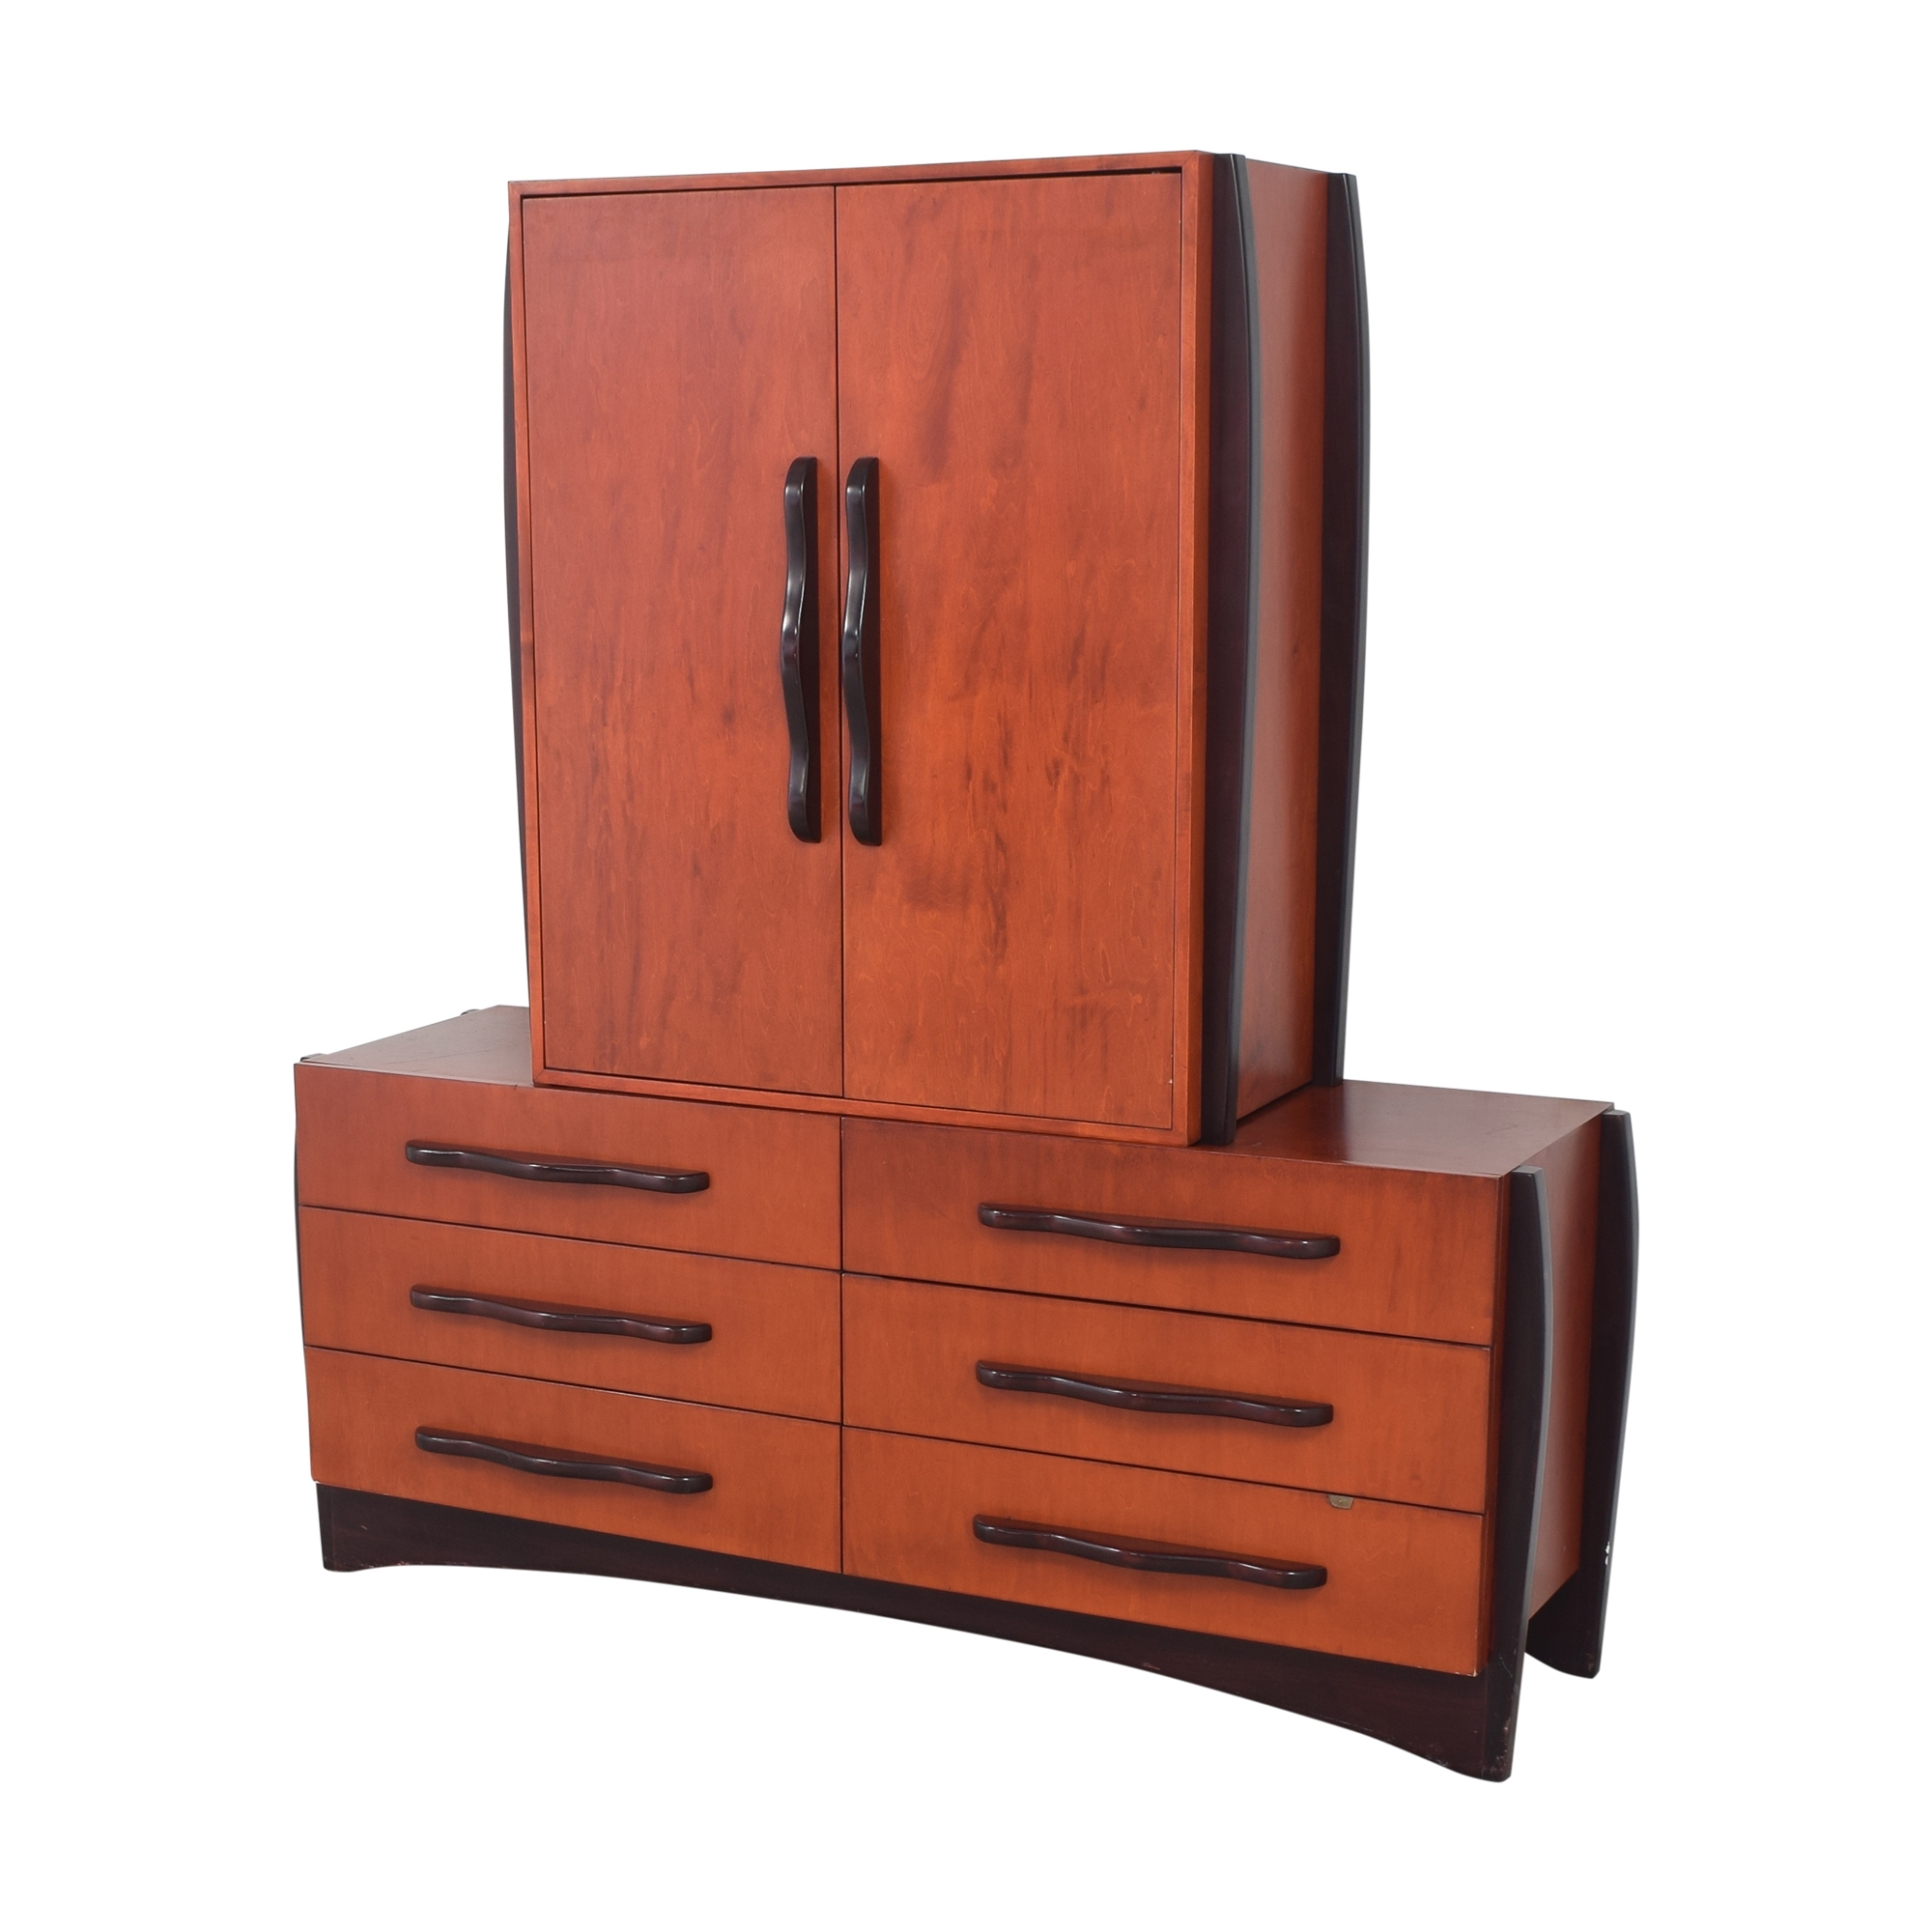 shop Dialogica Dialogica Malindi Double Dresser with Media Cabinet  online